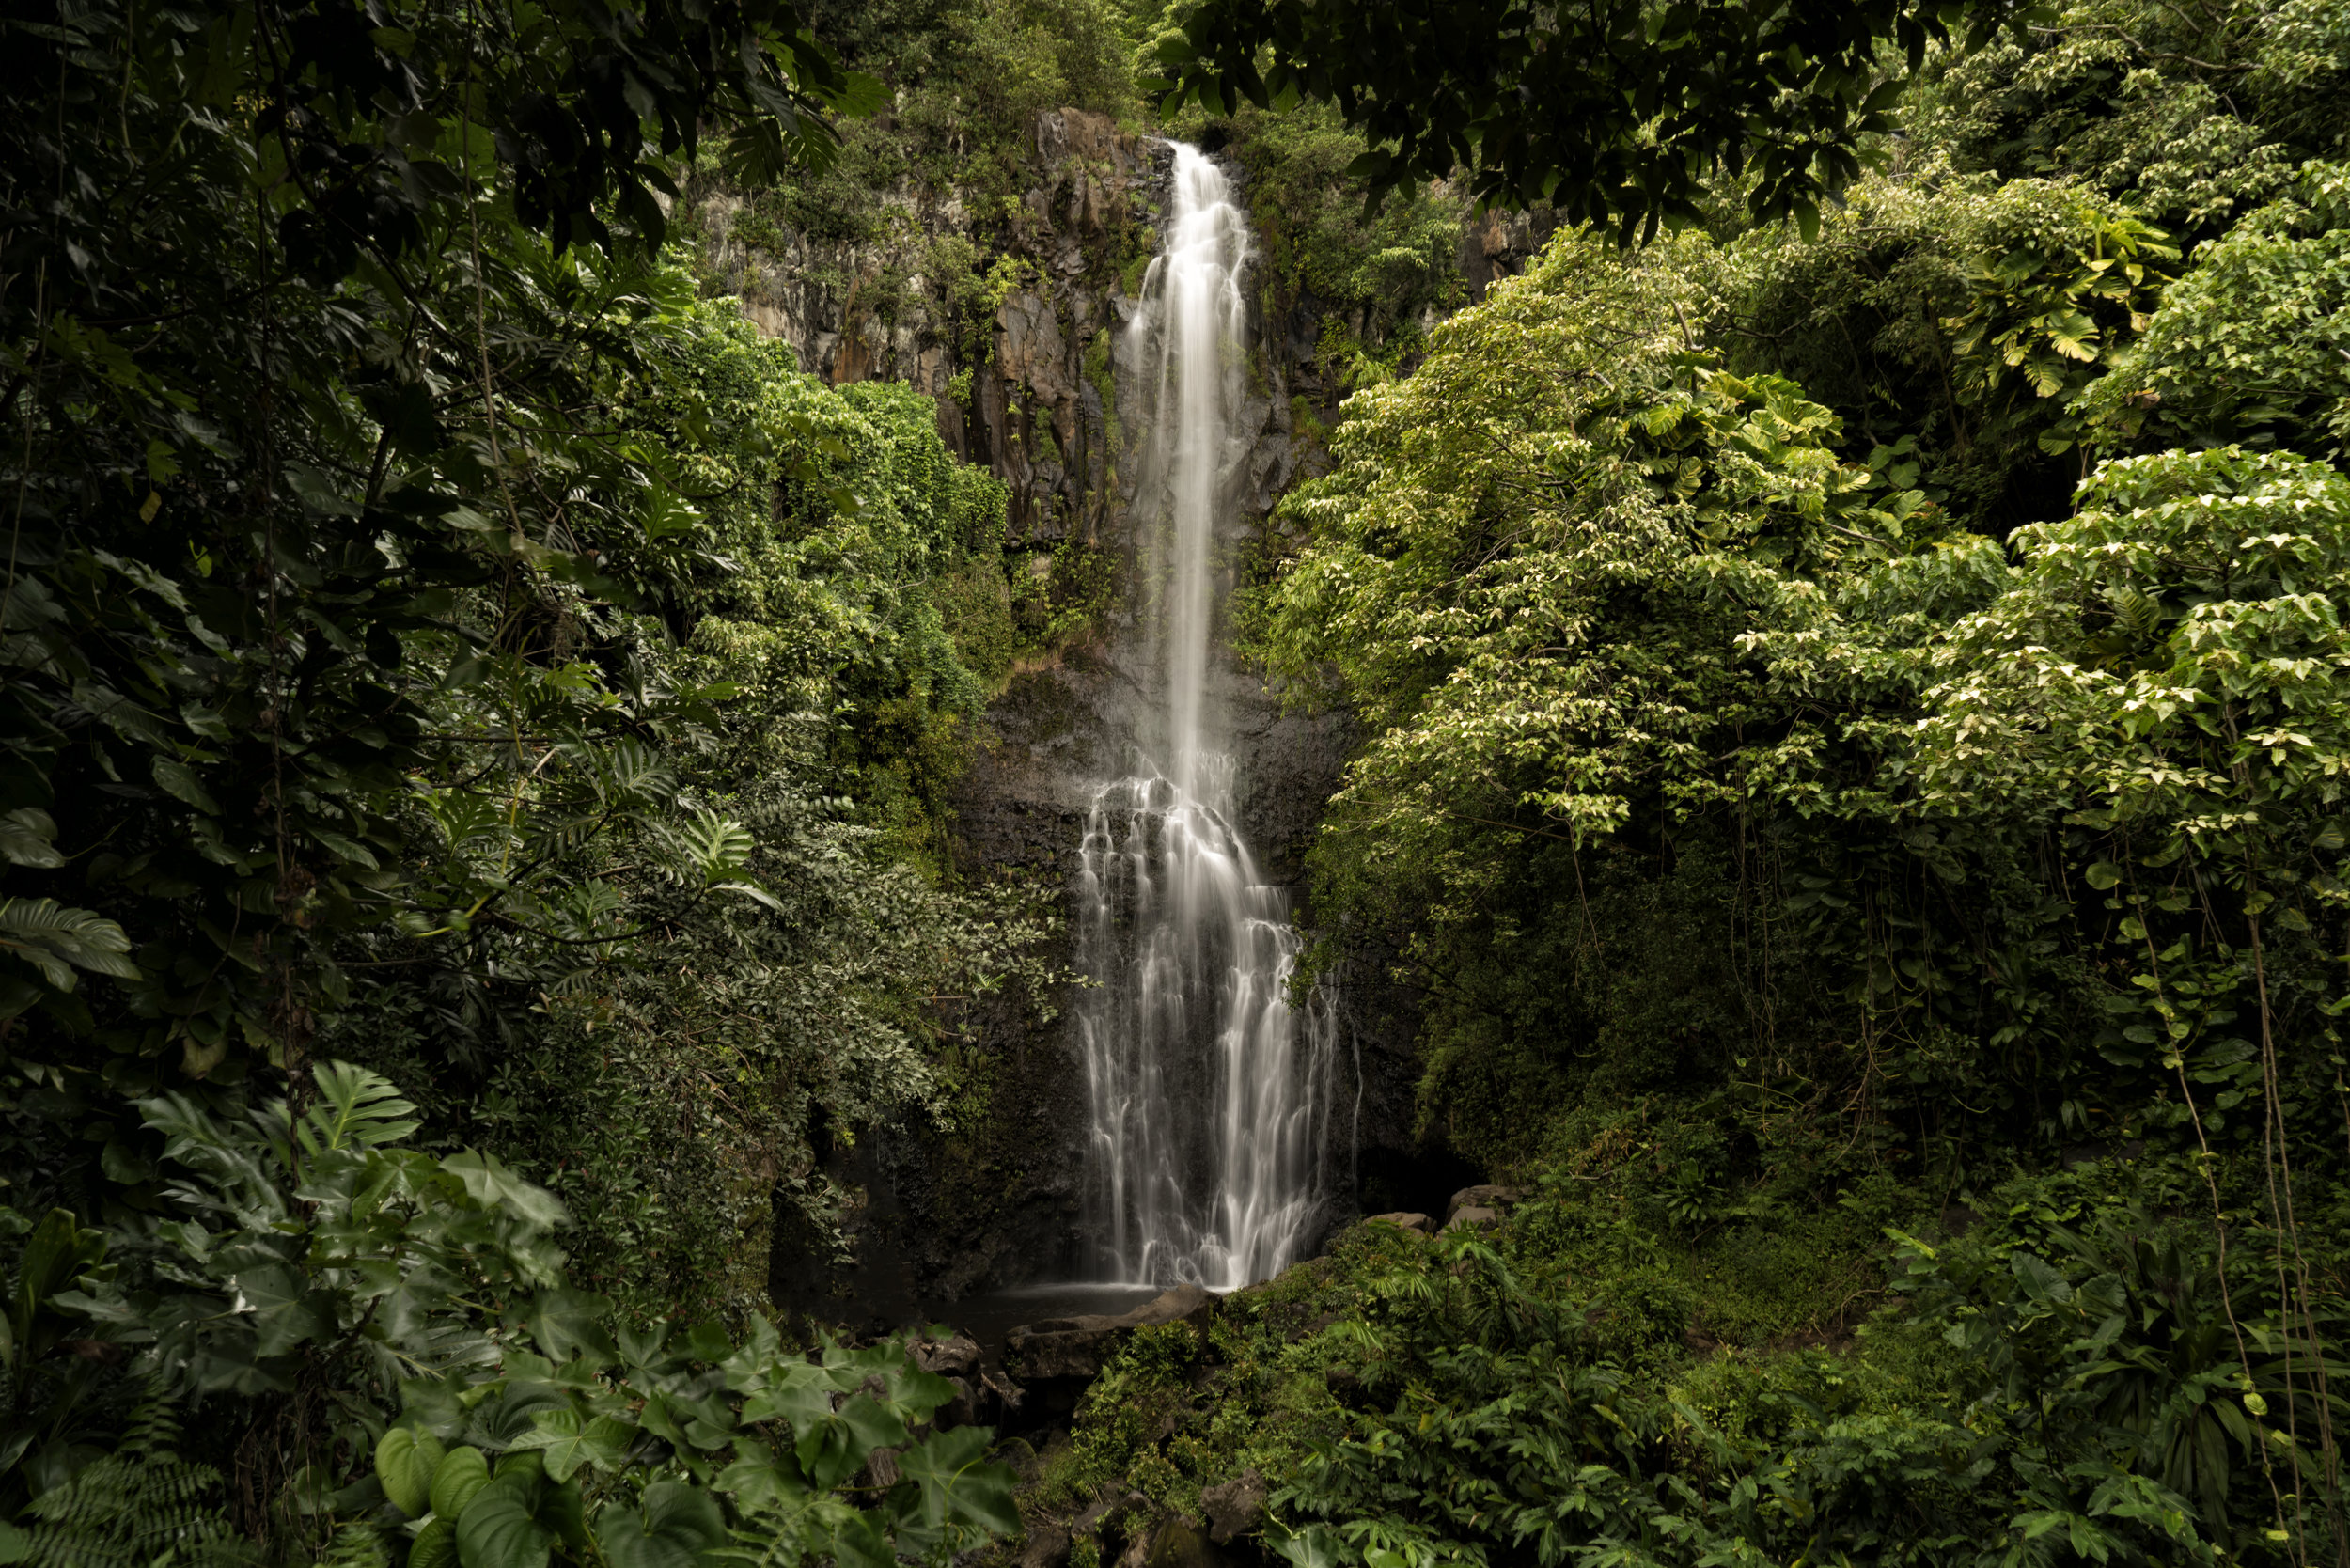 Maui November 2015